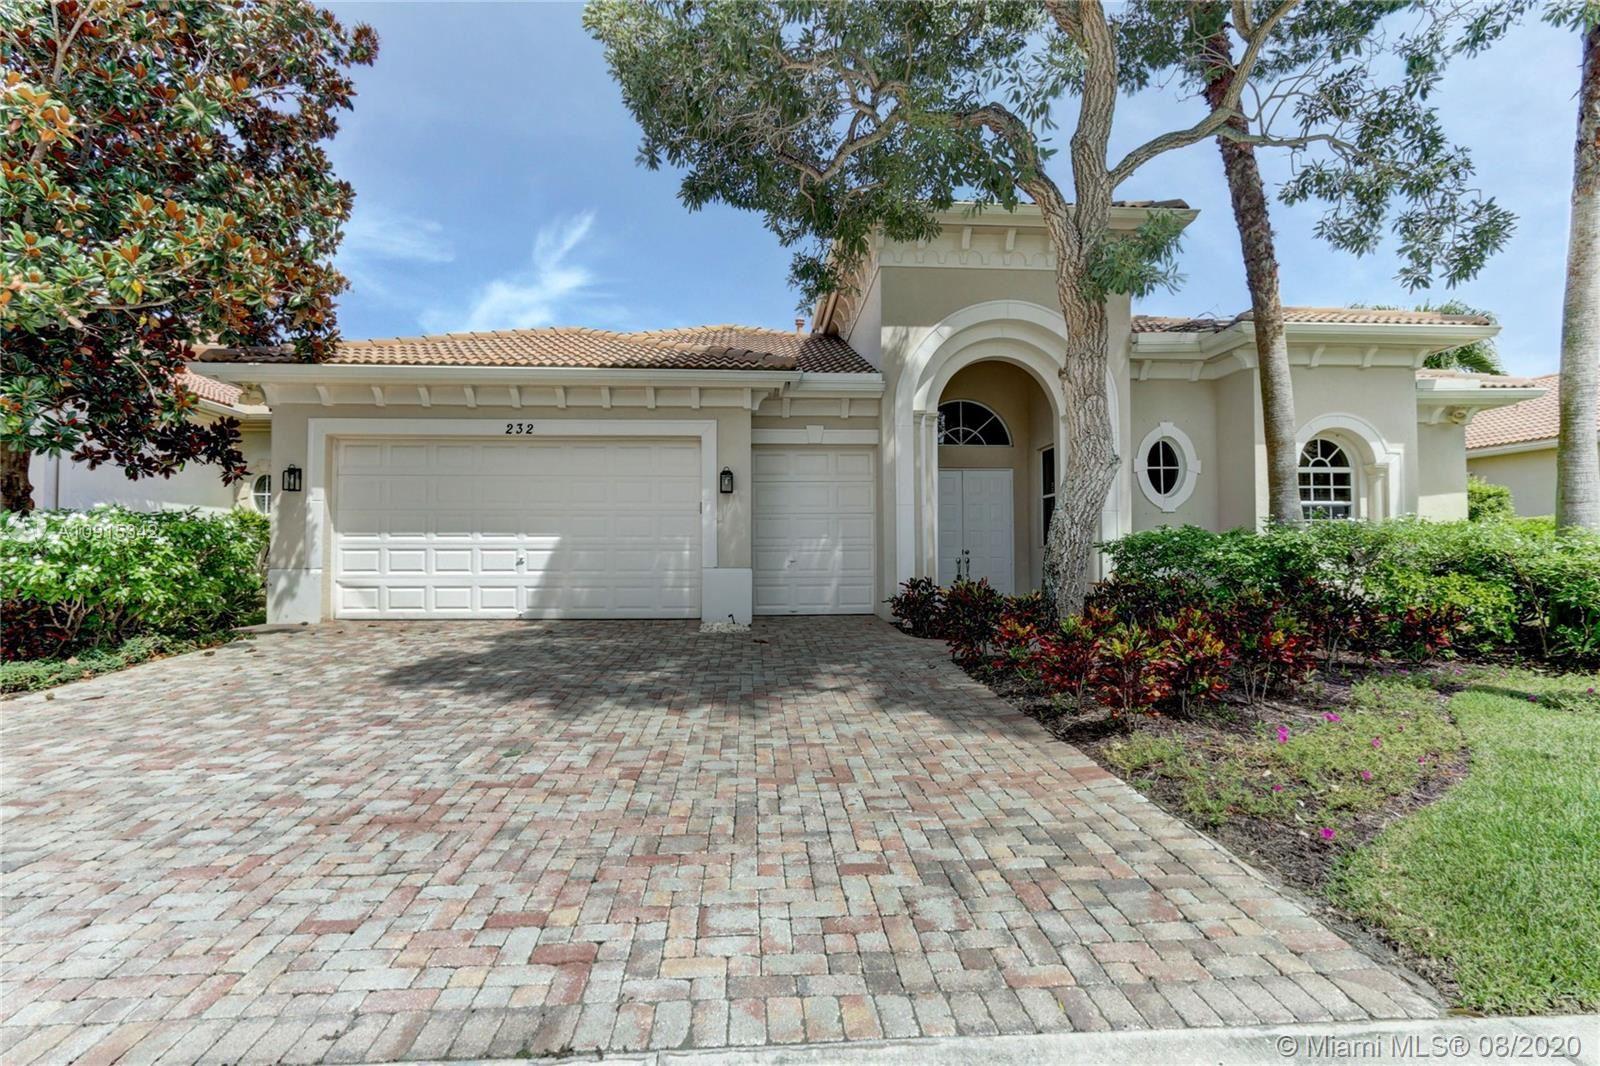 232 Montant Dr, Palm Beach Gardens, FL 33410 - #: A10915342